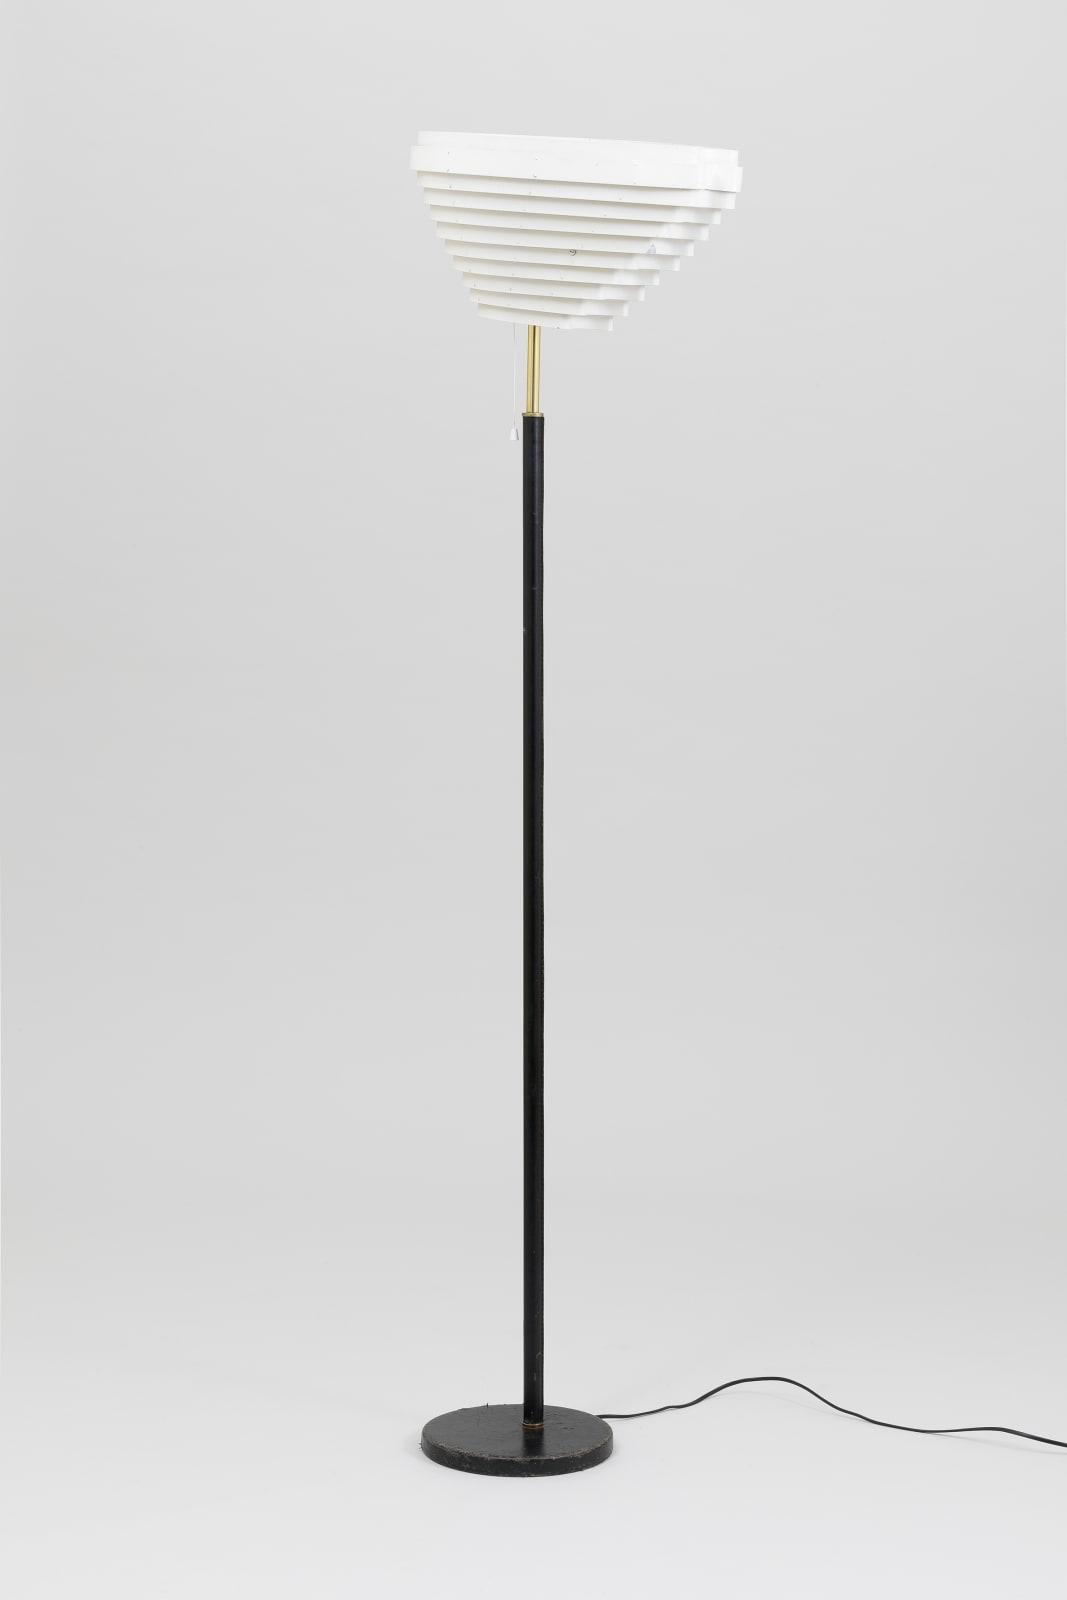 Alvar Aalto, Angel Wing lamp